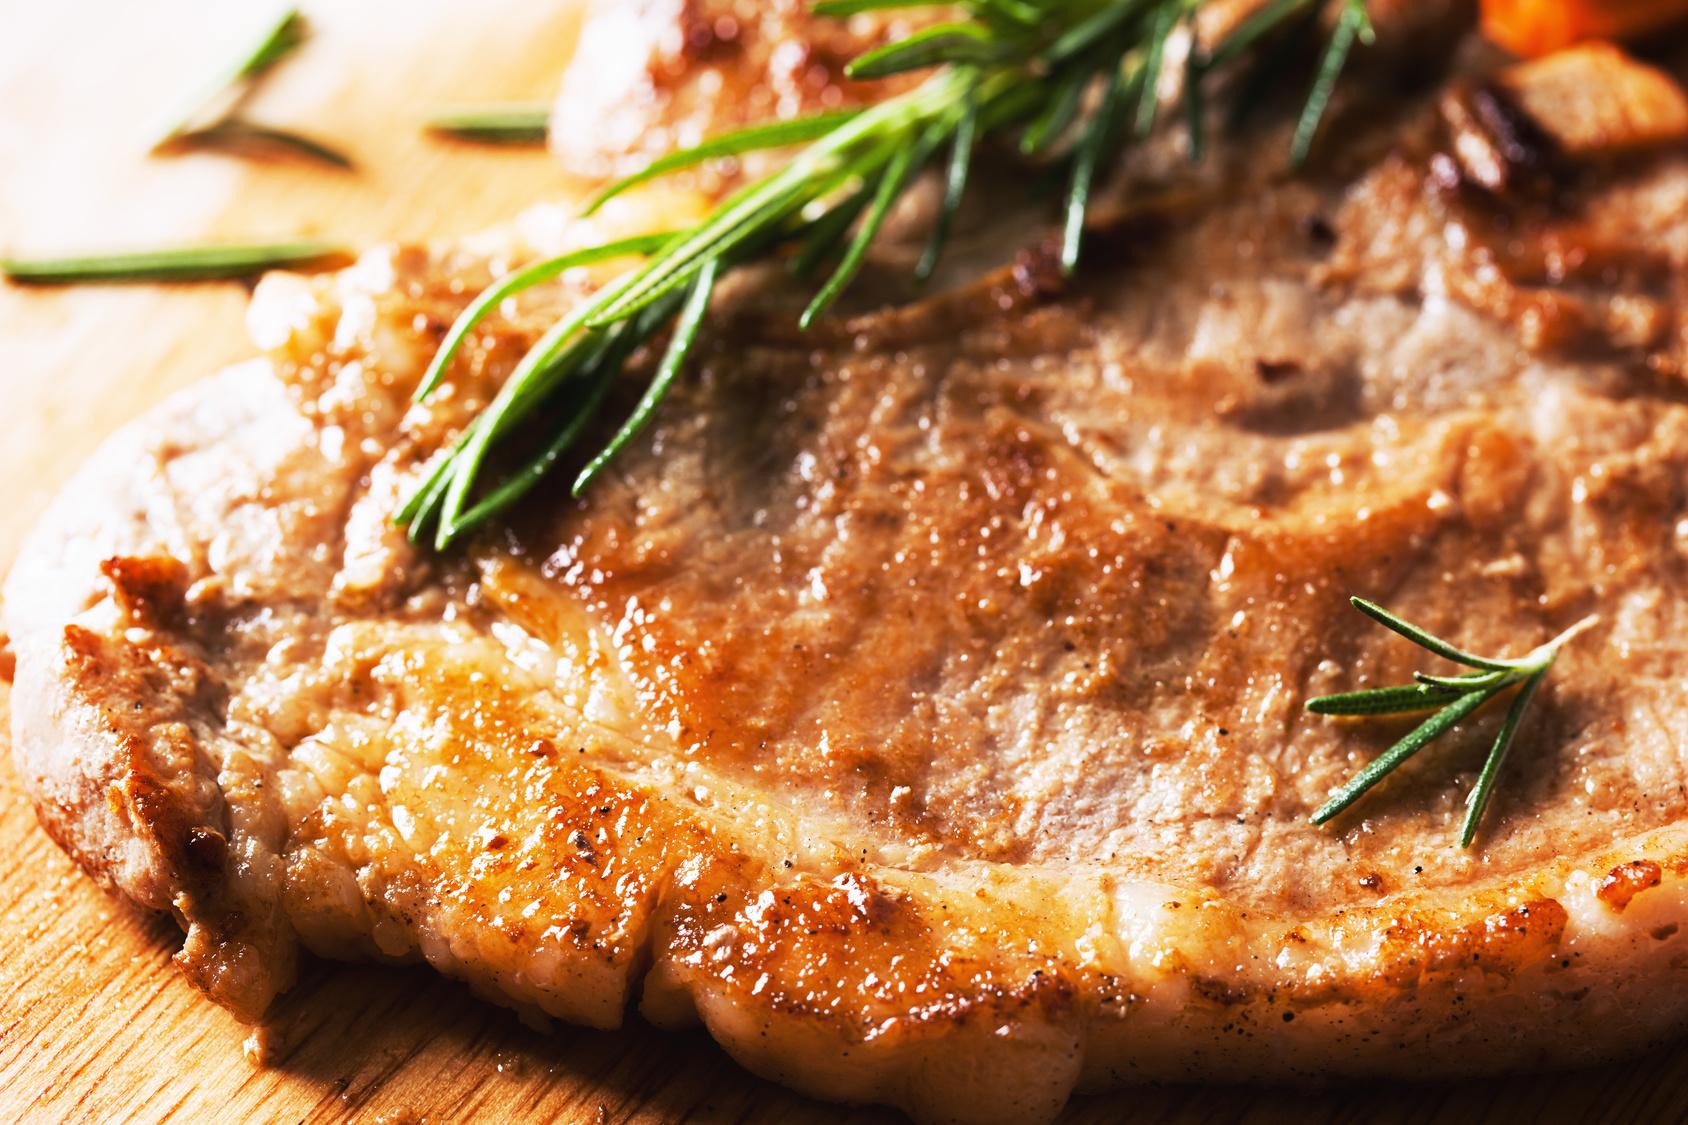 grilled pork chop on wooden board